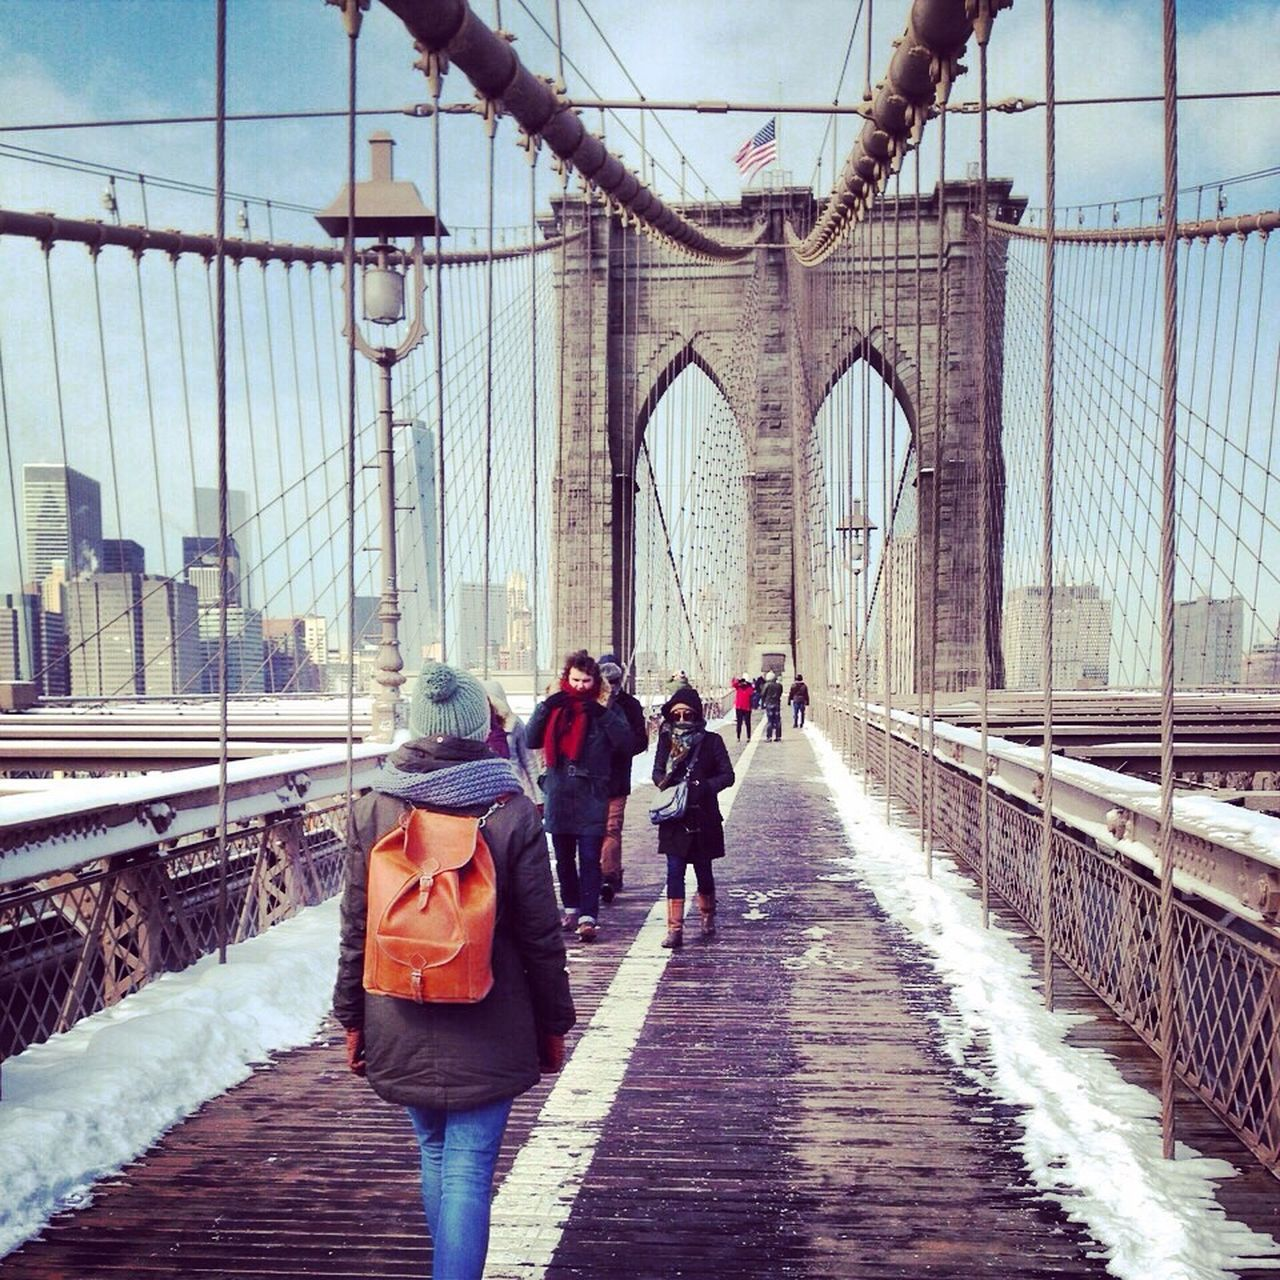 Brooklyn Brooklyn Bridge / New York NYC NYC Photography Manhattan Travel Winter New York City New York Bridge Bridge - Man Made Structure Brooklyn Bridge  Travel Destinations Snow Travel Photography From The Back Blue Sky